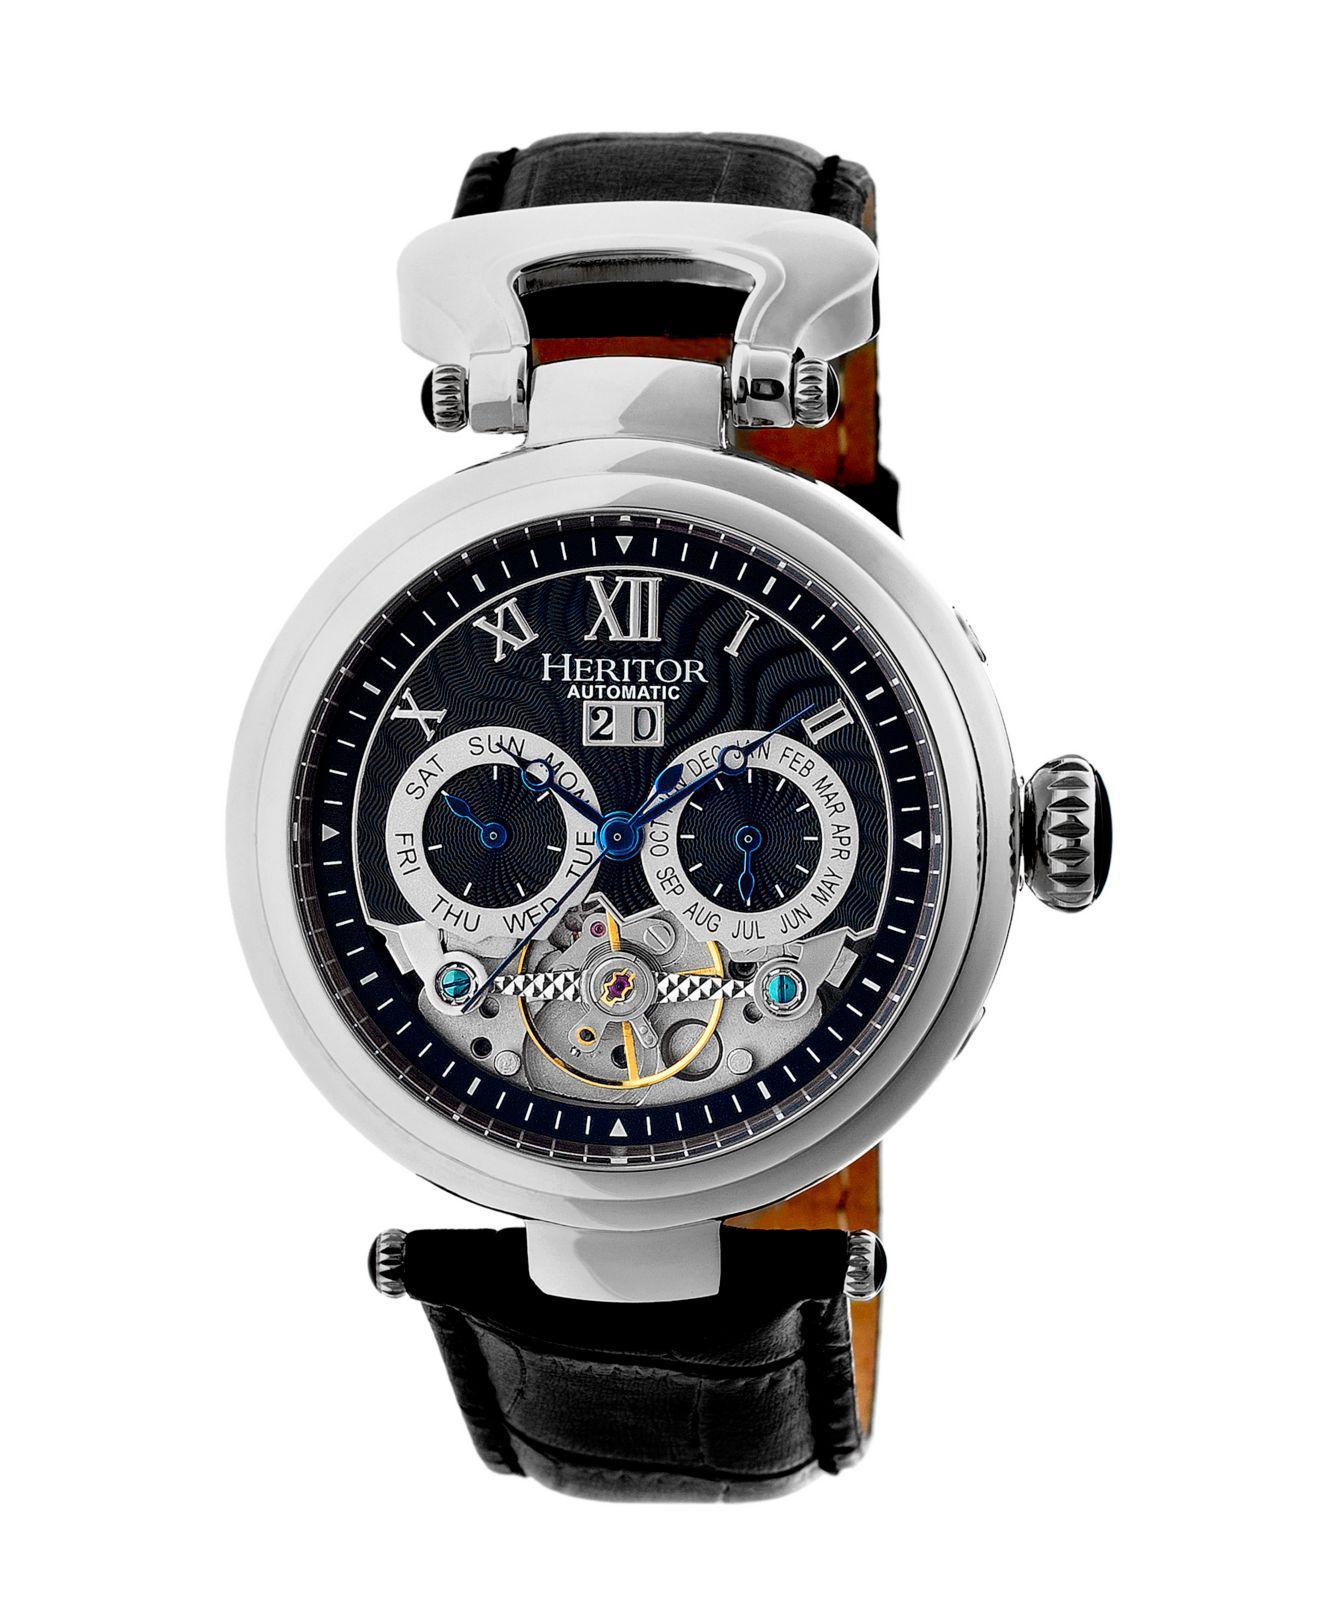 77b437f0f Lyst - Heritor Automatic Ganzi Silver & Black Leather Watches 44mm ...